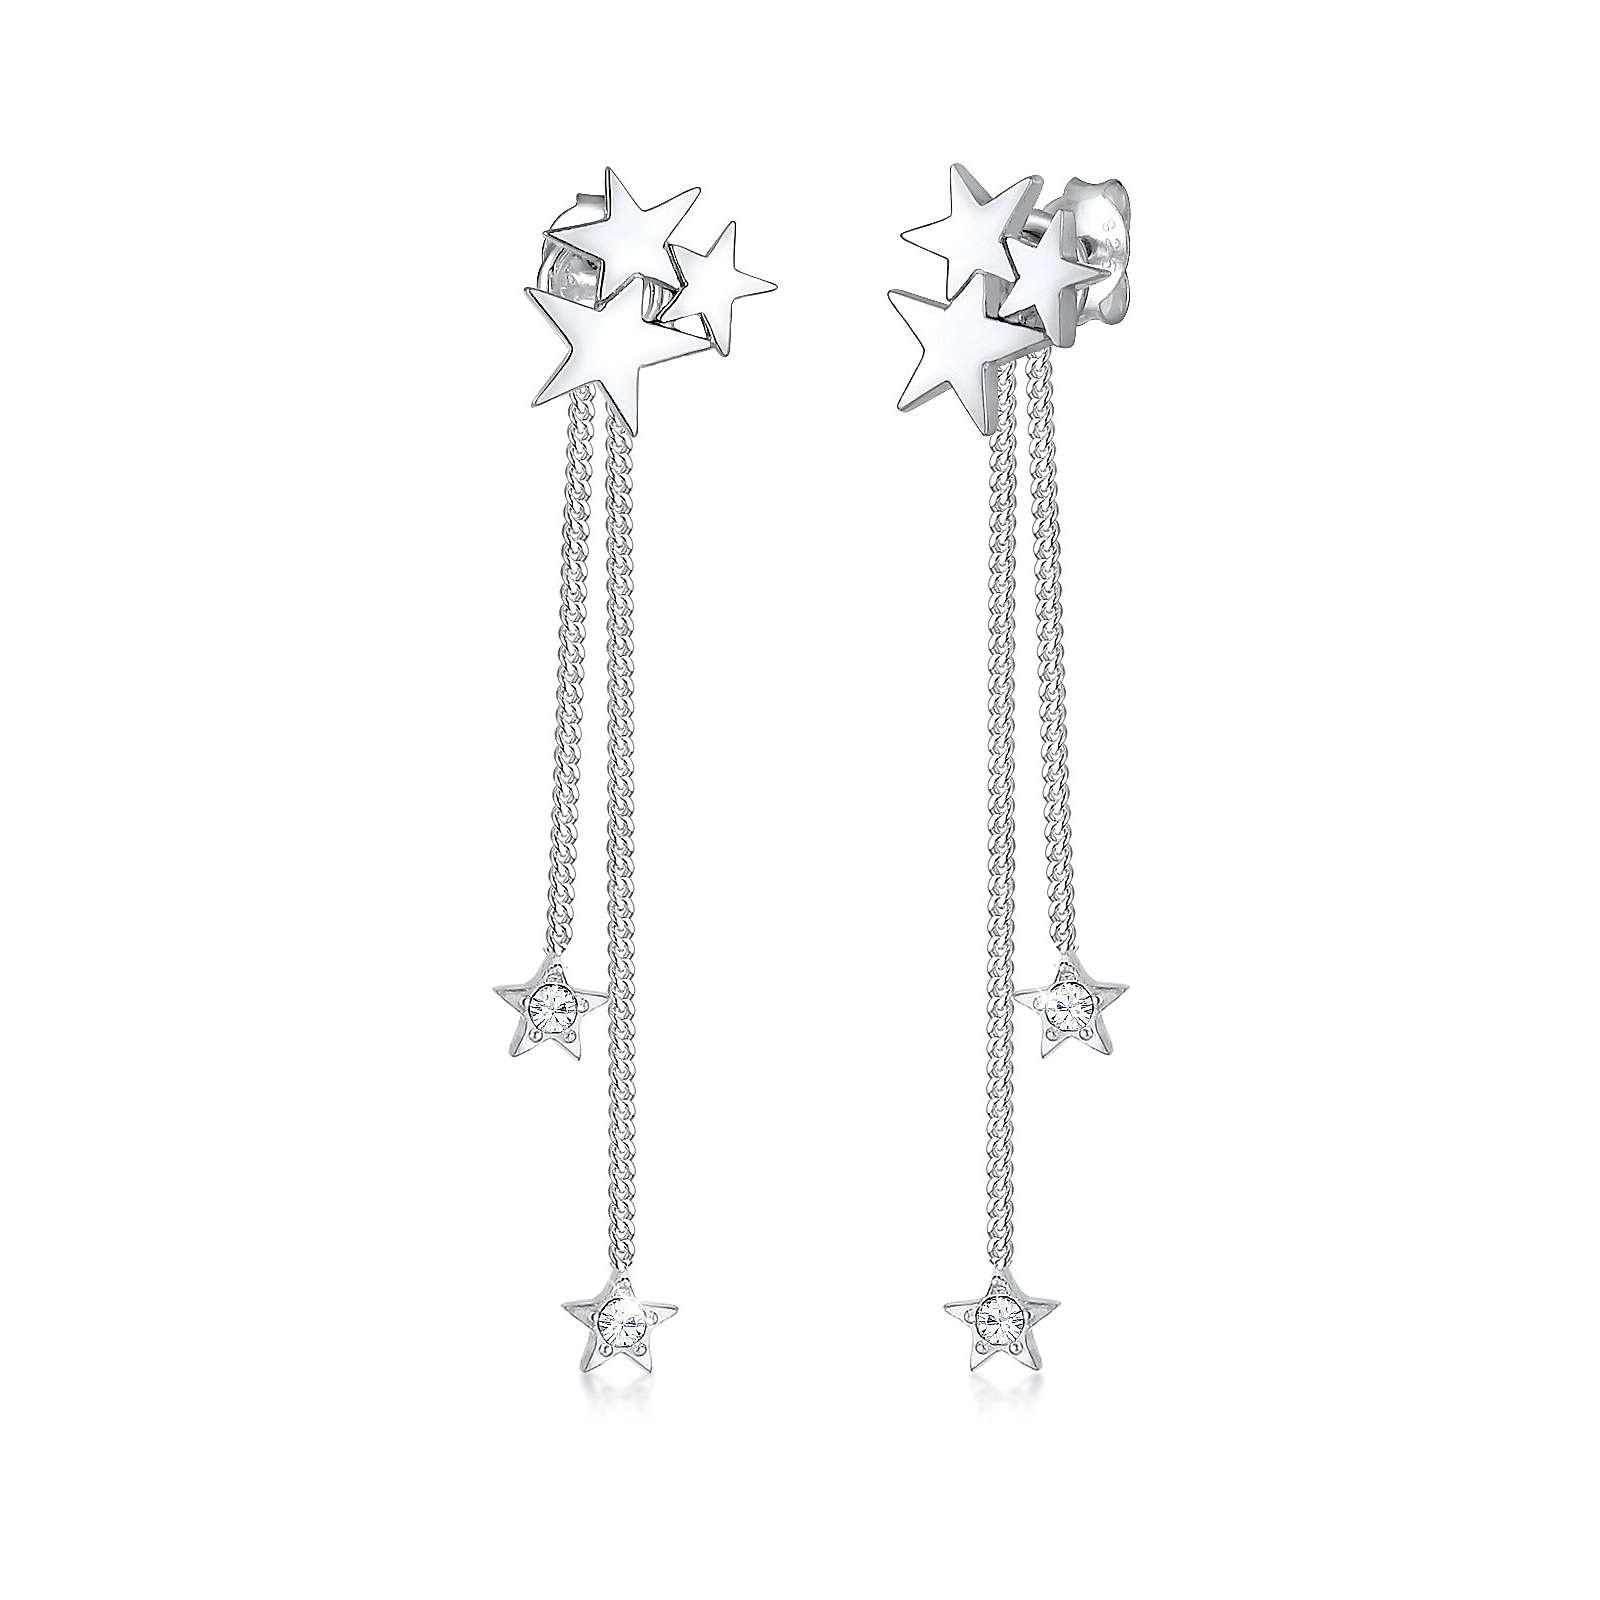 Elli PREMIUM Ohrringe Sterne Swarovski® Kristalle 925 Sterling Silber Ohrringe silber Damen